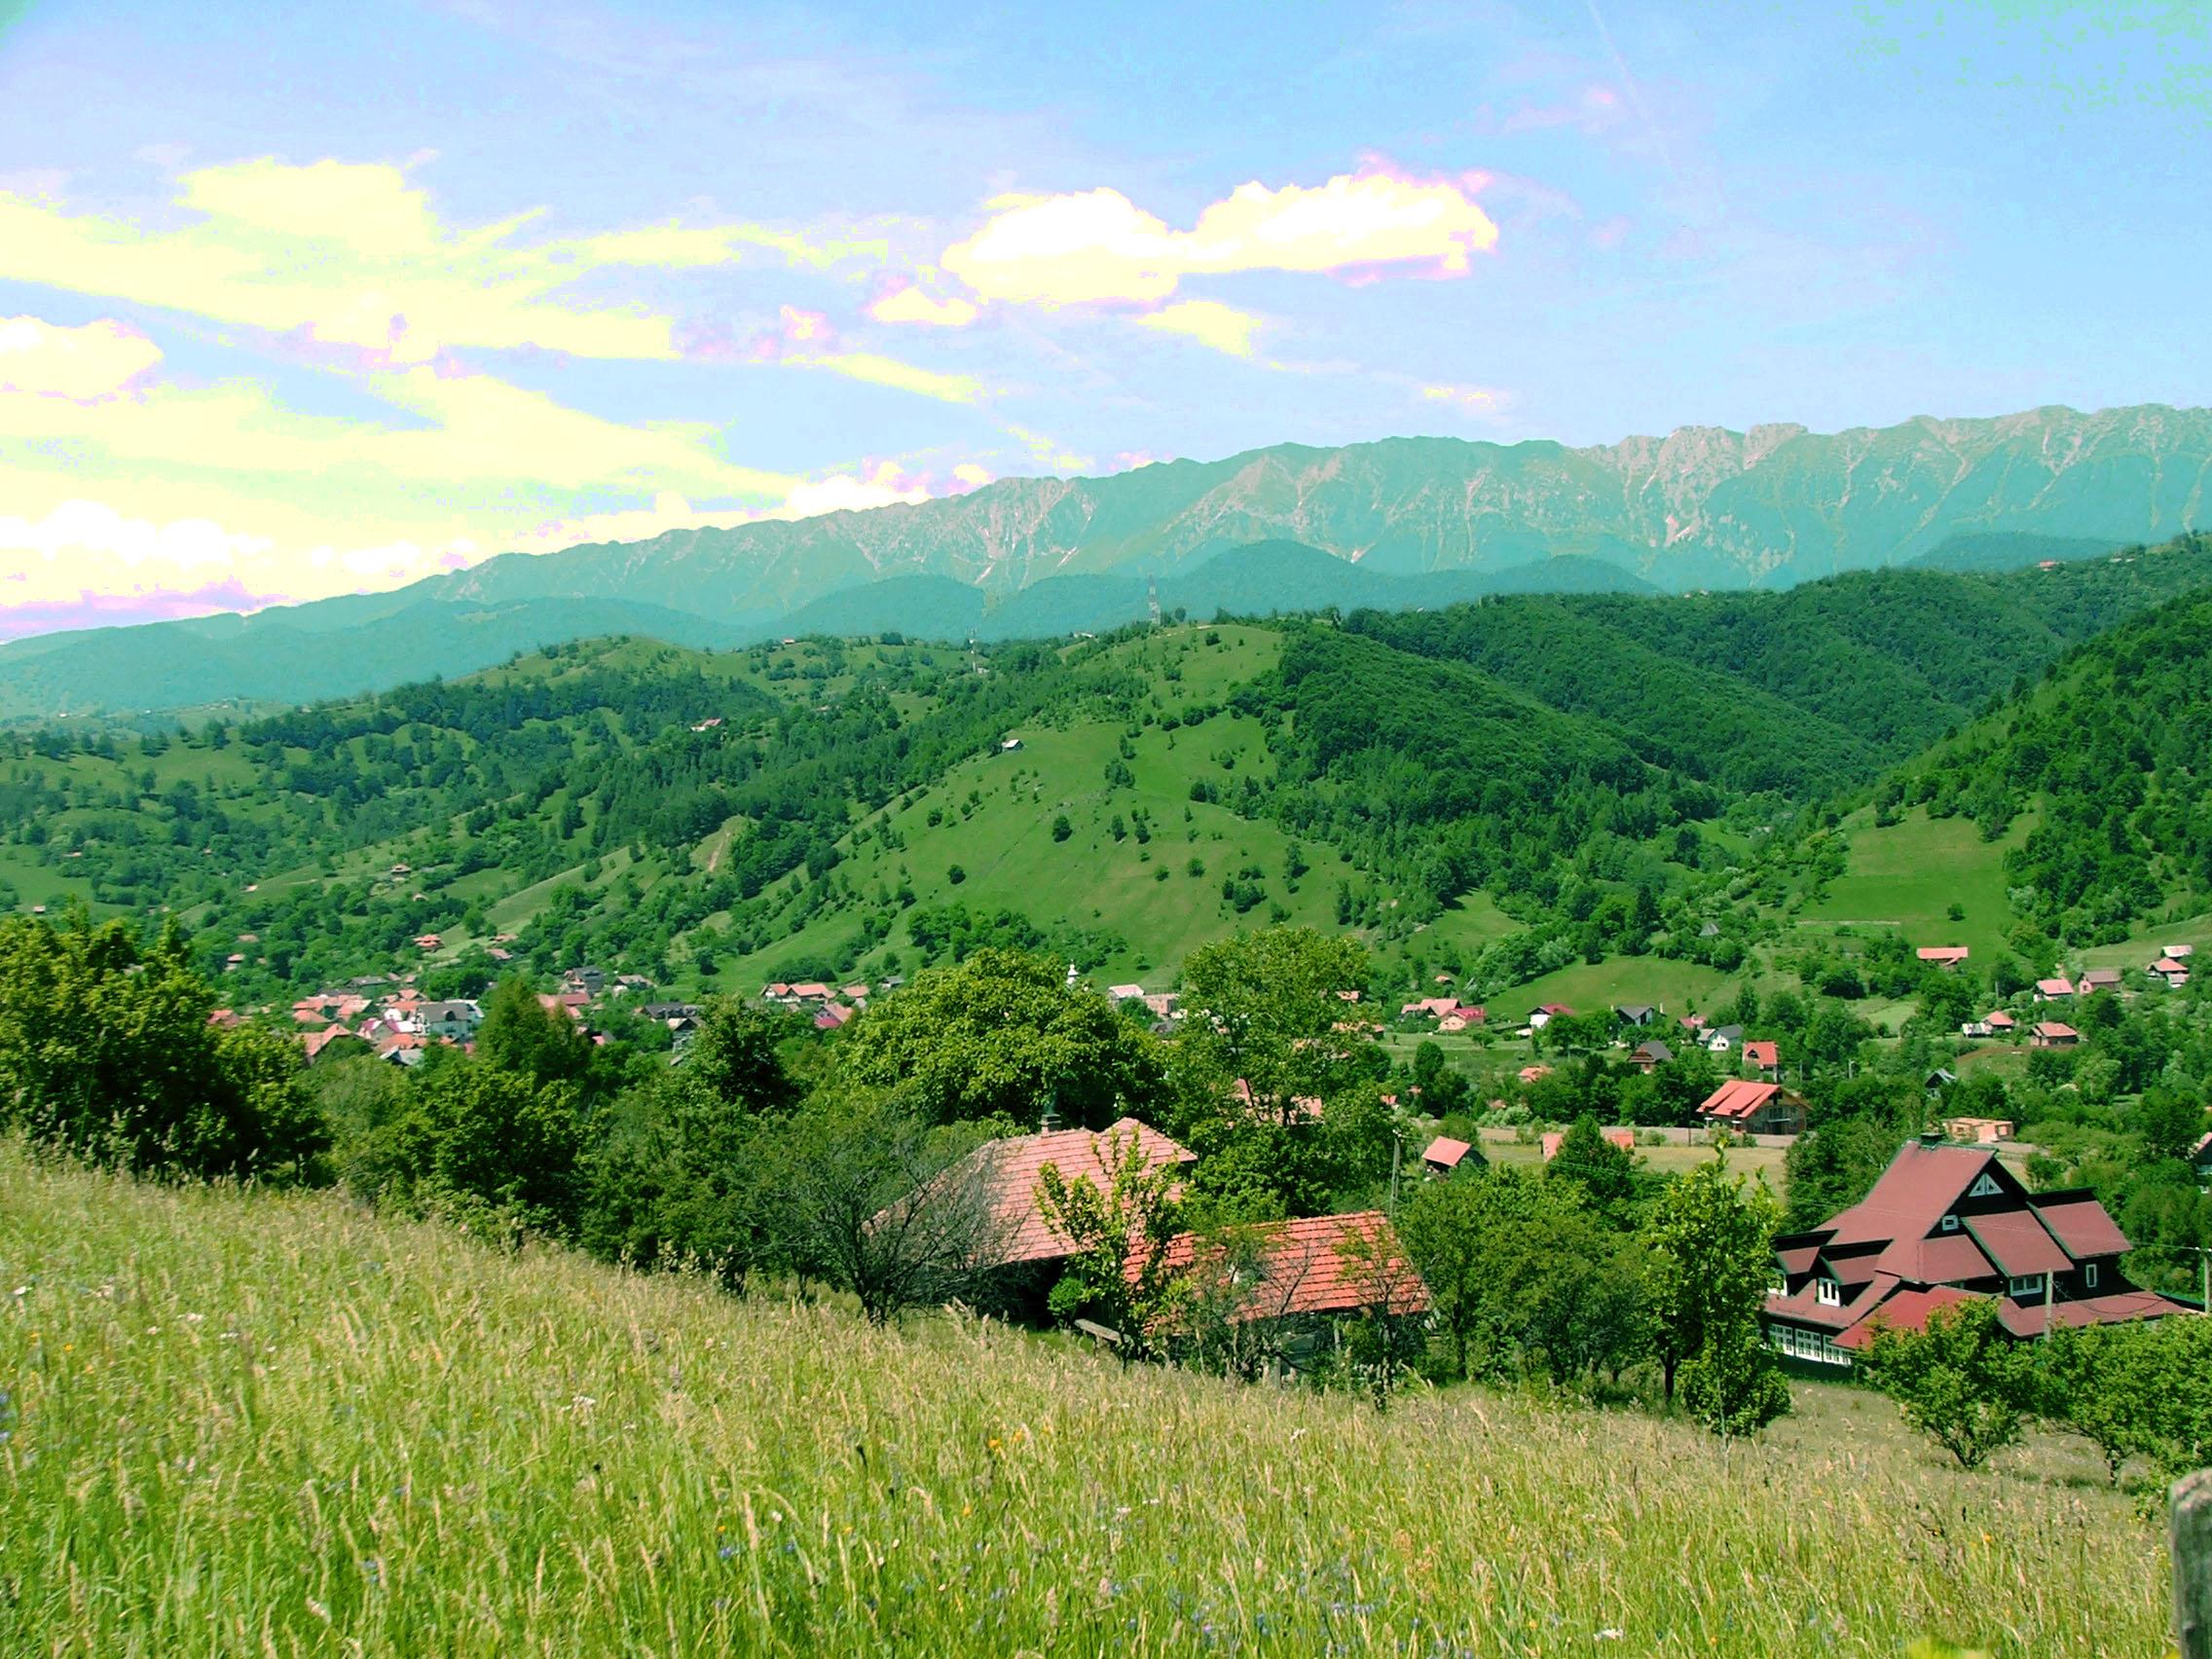 România – o fotografie şi o poveste (19)